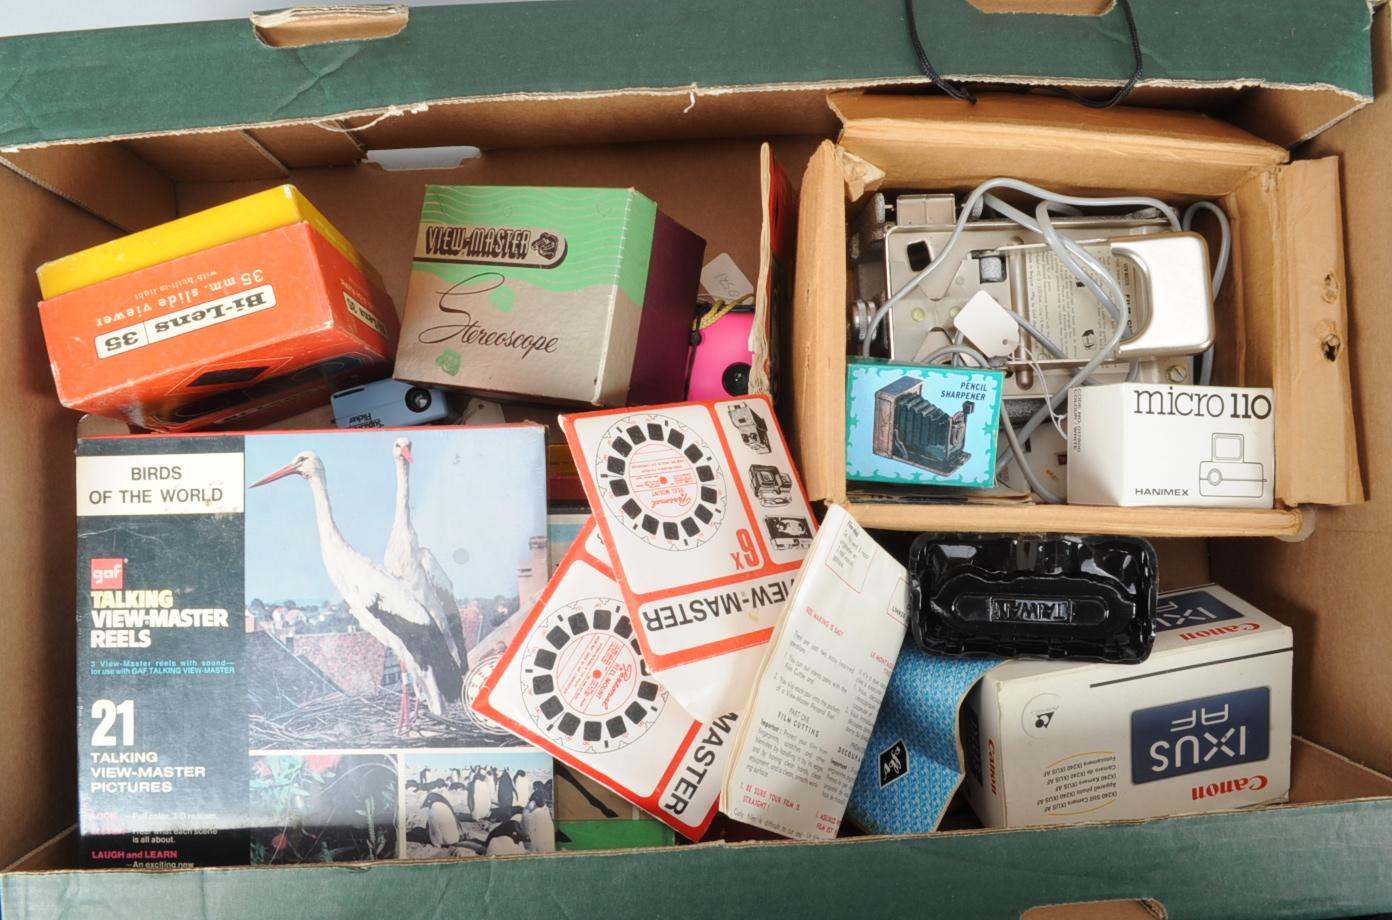 Lot 406 - Novelty Camera Items, including a Viewmaster, Viewmaster reels, talking Viewmaster reels, Film